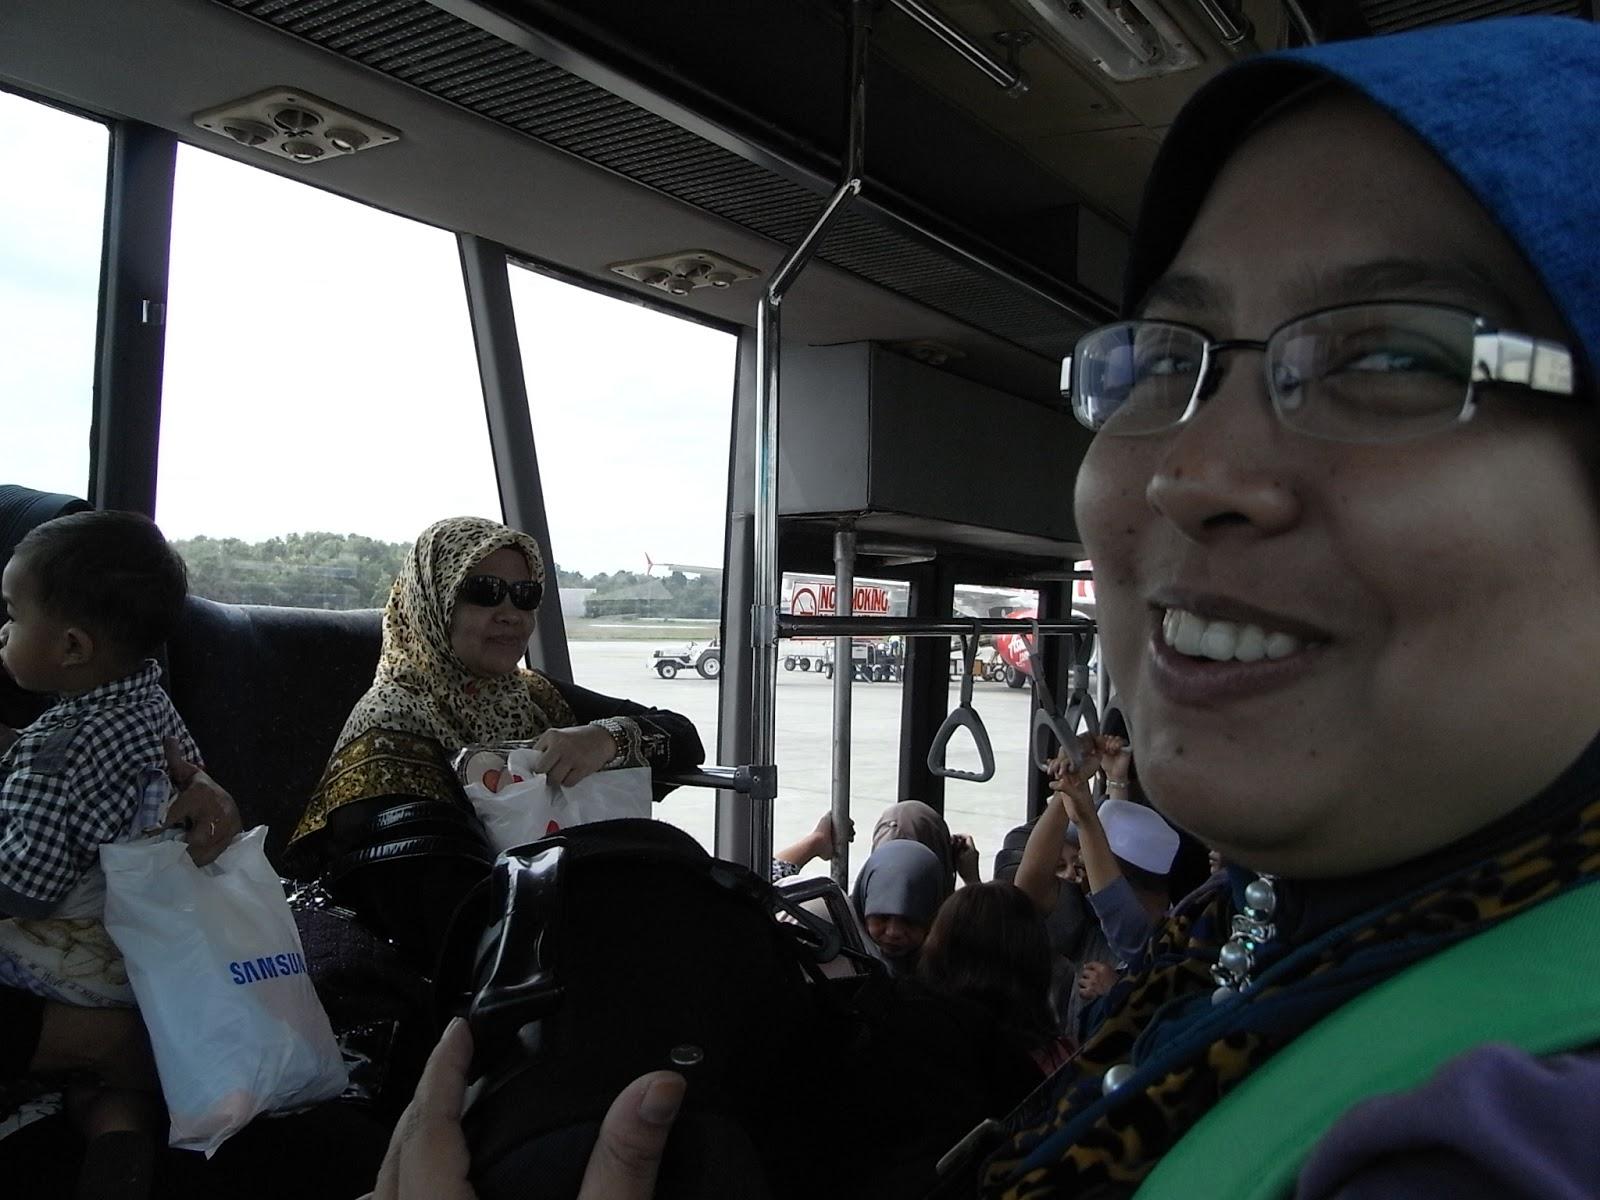 Entri Percutian Saya Airport Pekanbaru Indonesia